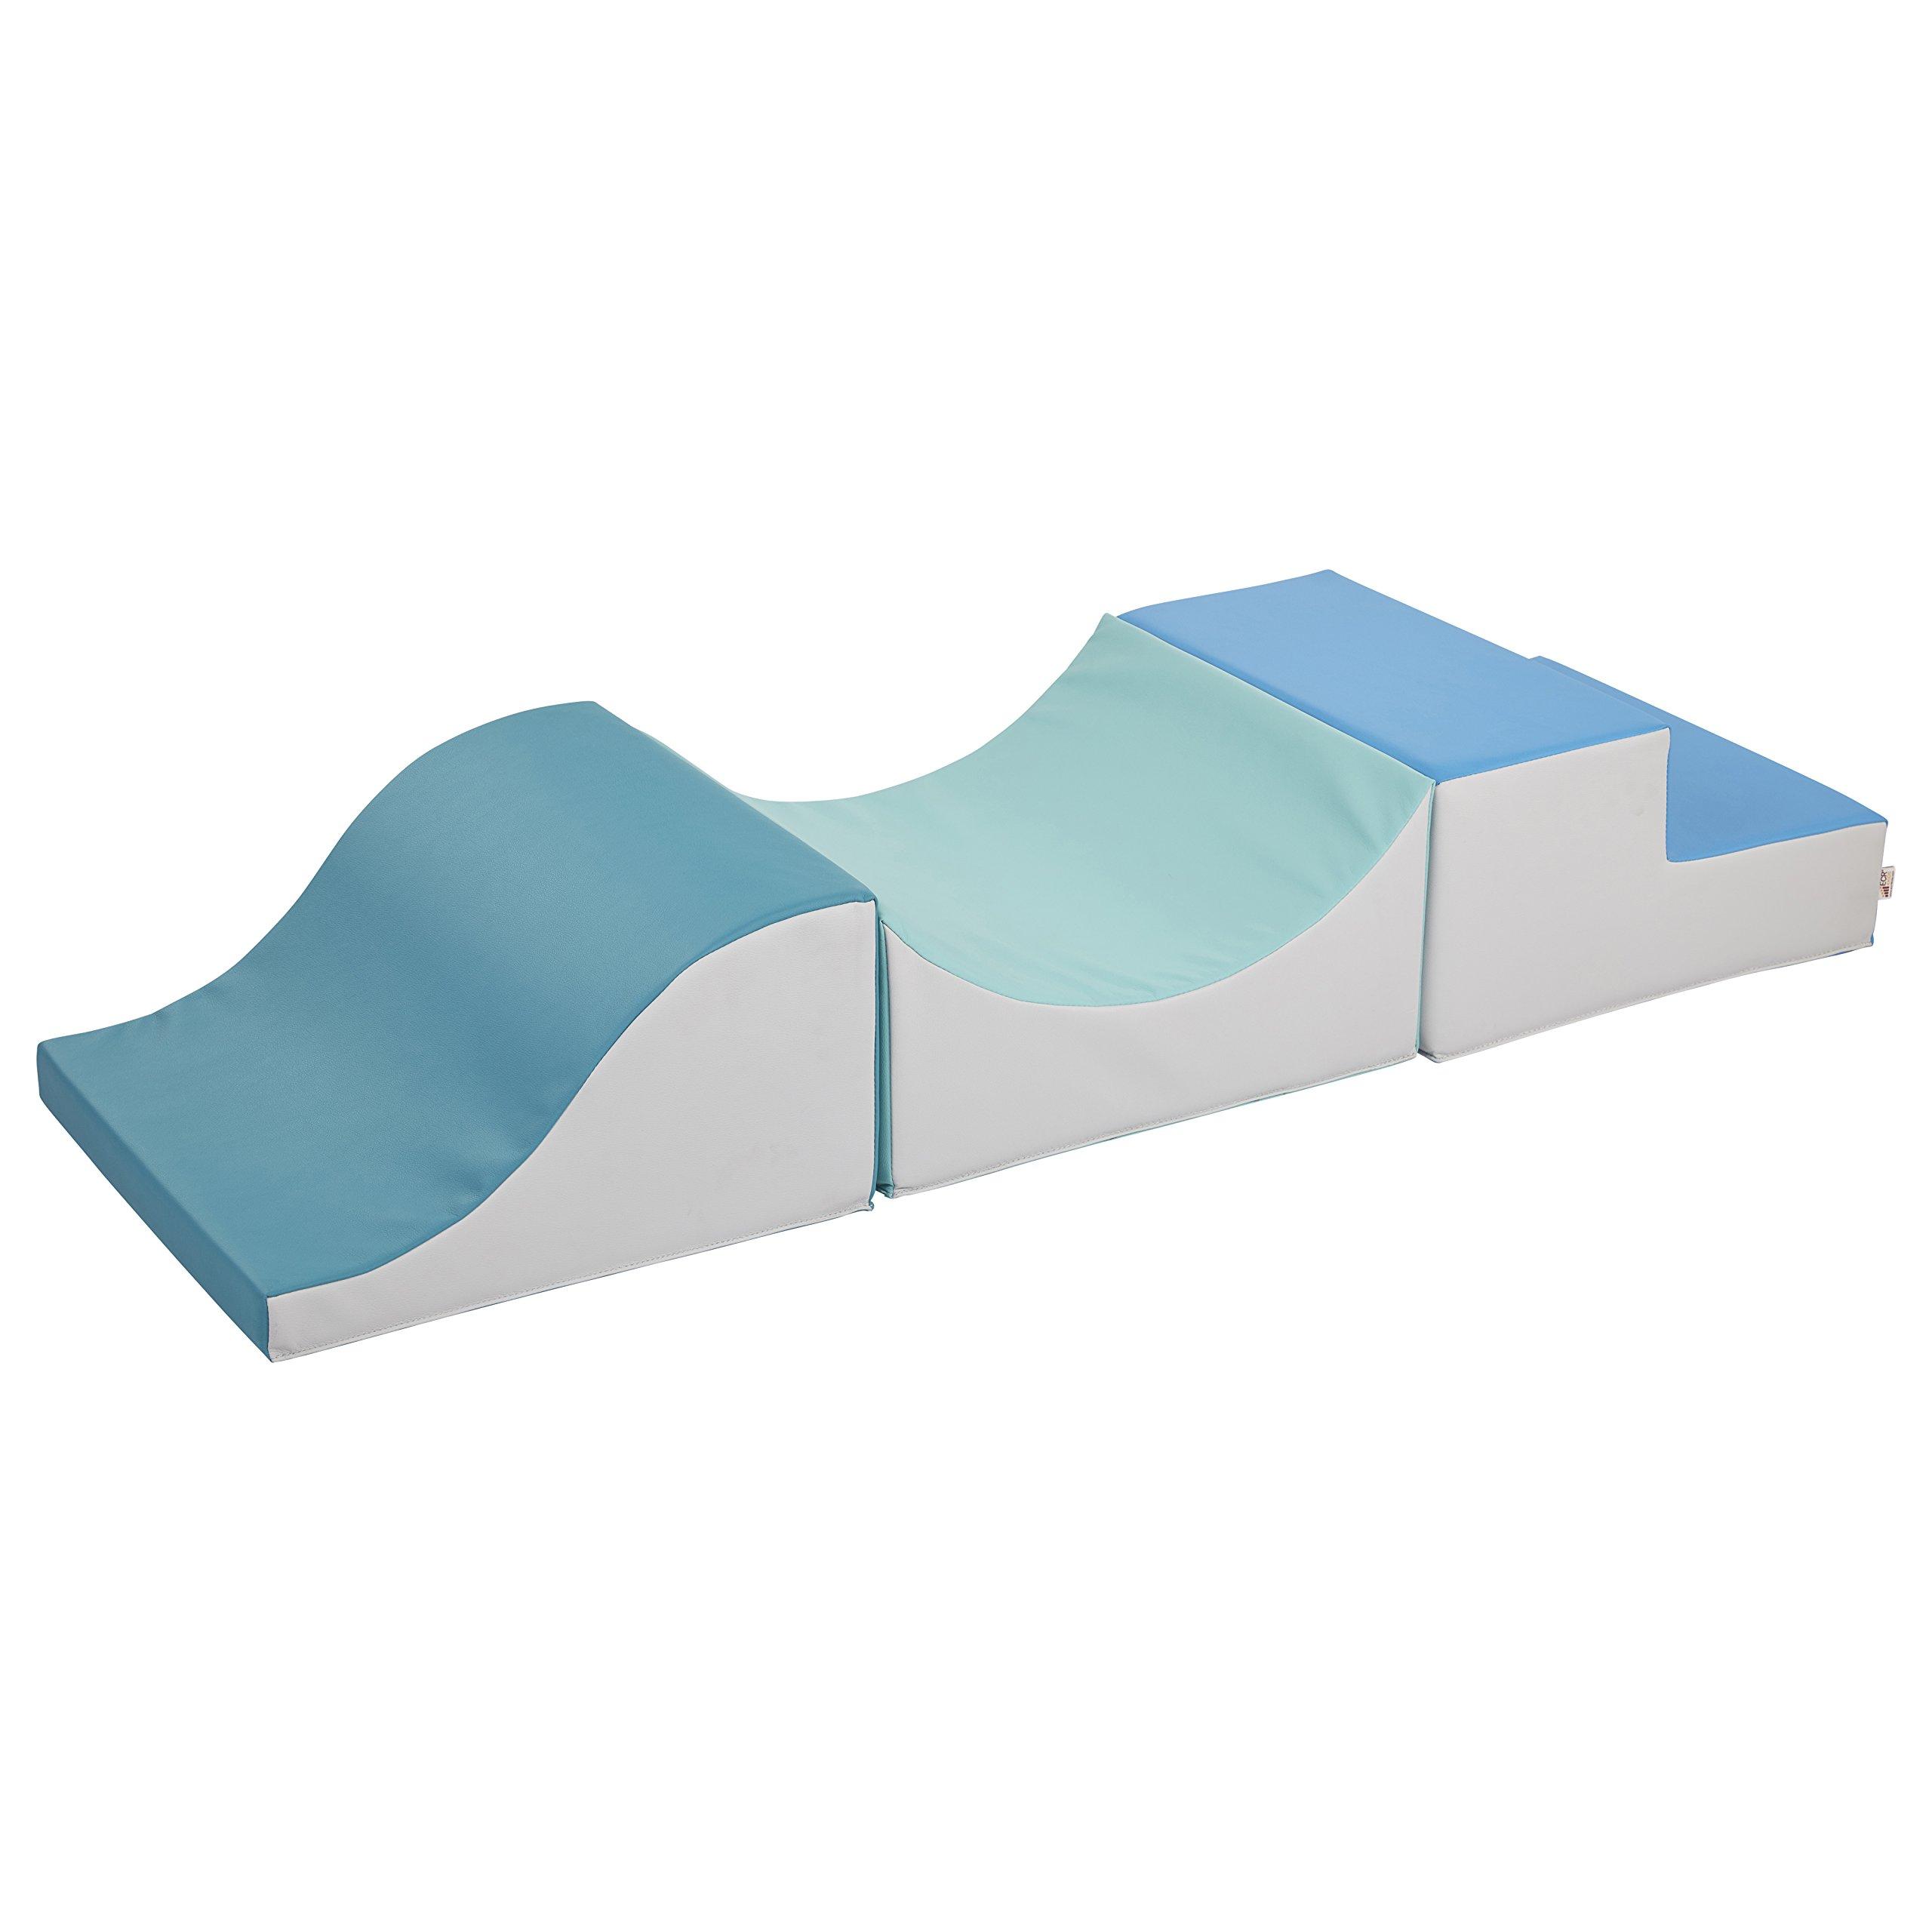 ECR4Kids Softzone Thrill-Scape Play Foam Climber, Contemporary